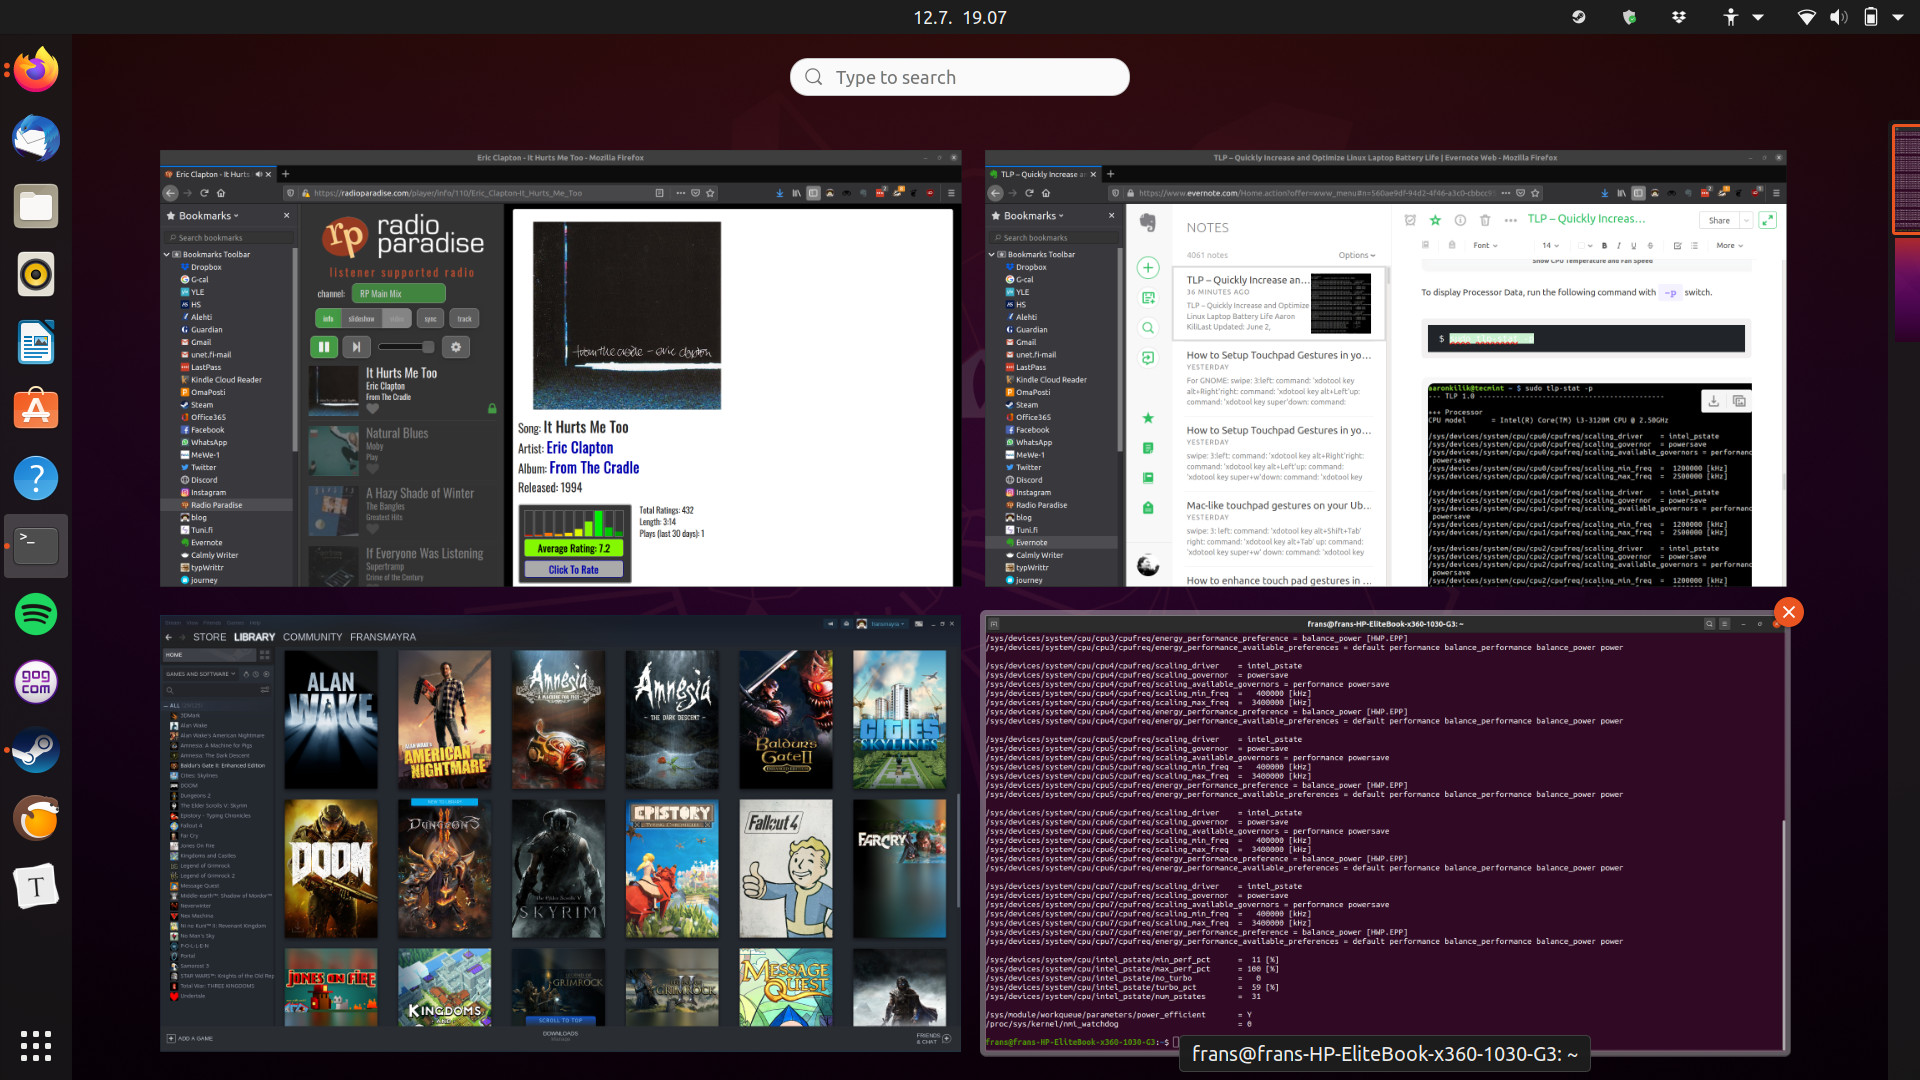 Ubuntu on HP Elitebook x360 (screenshot).